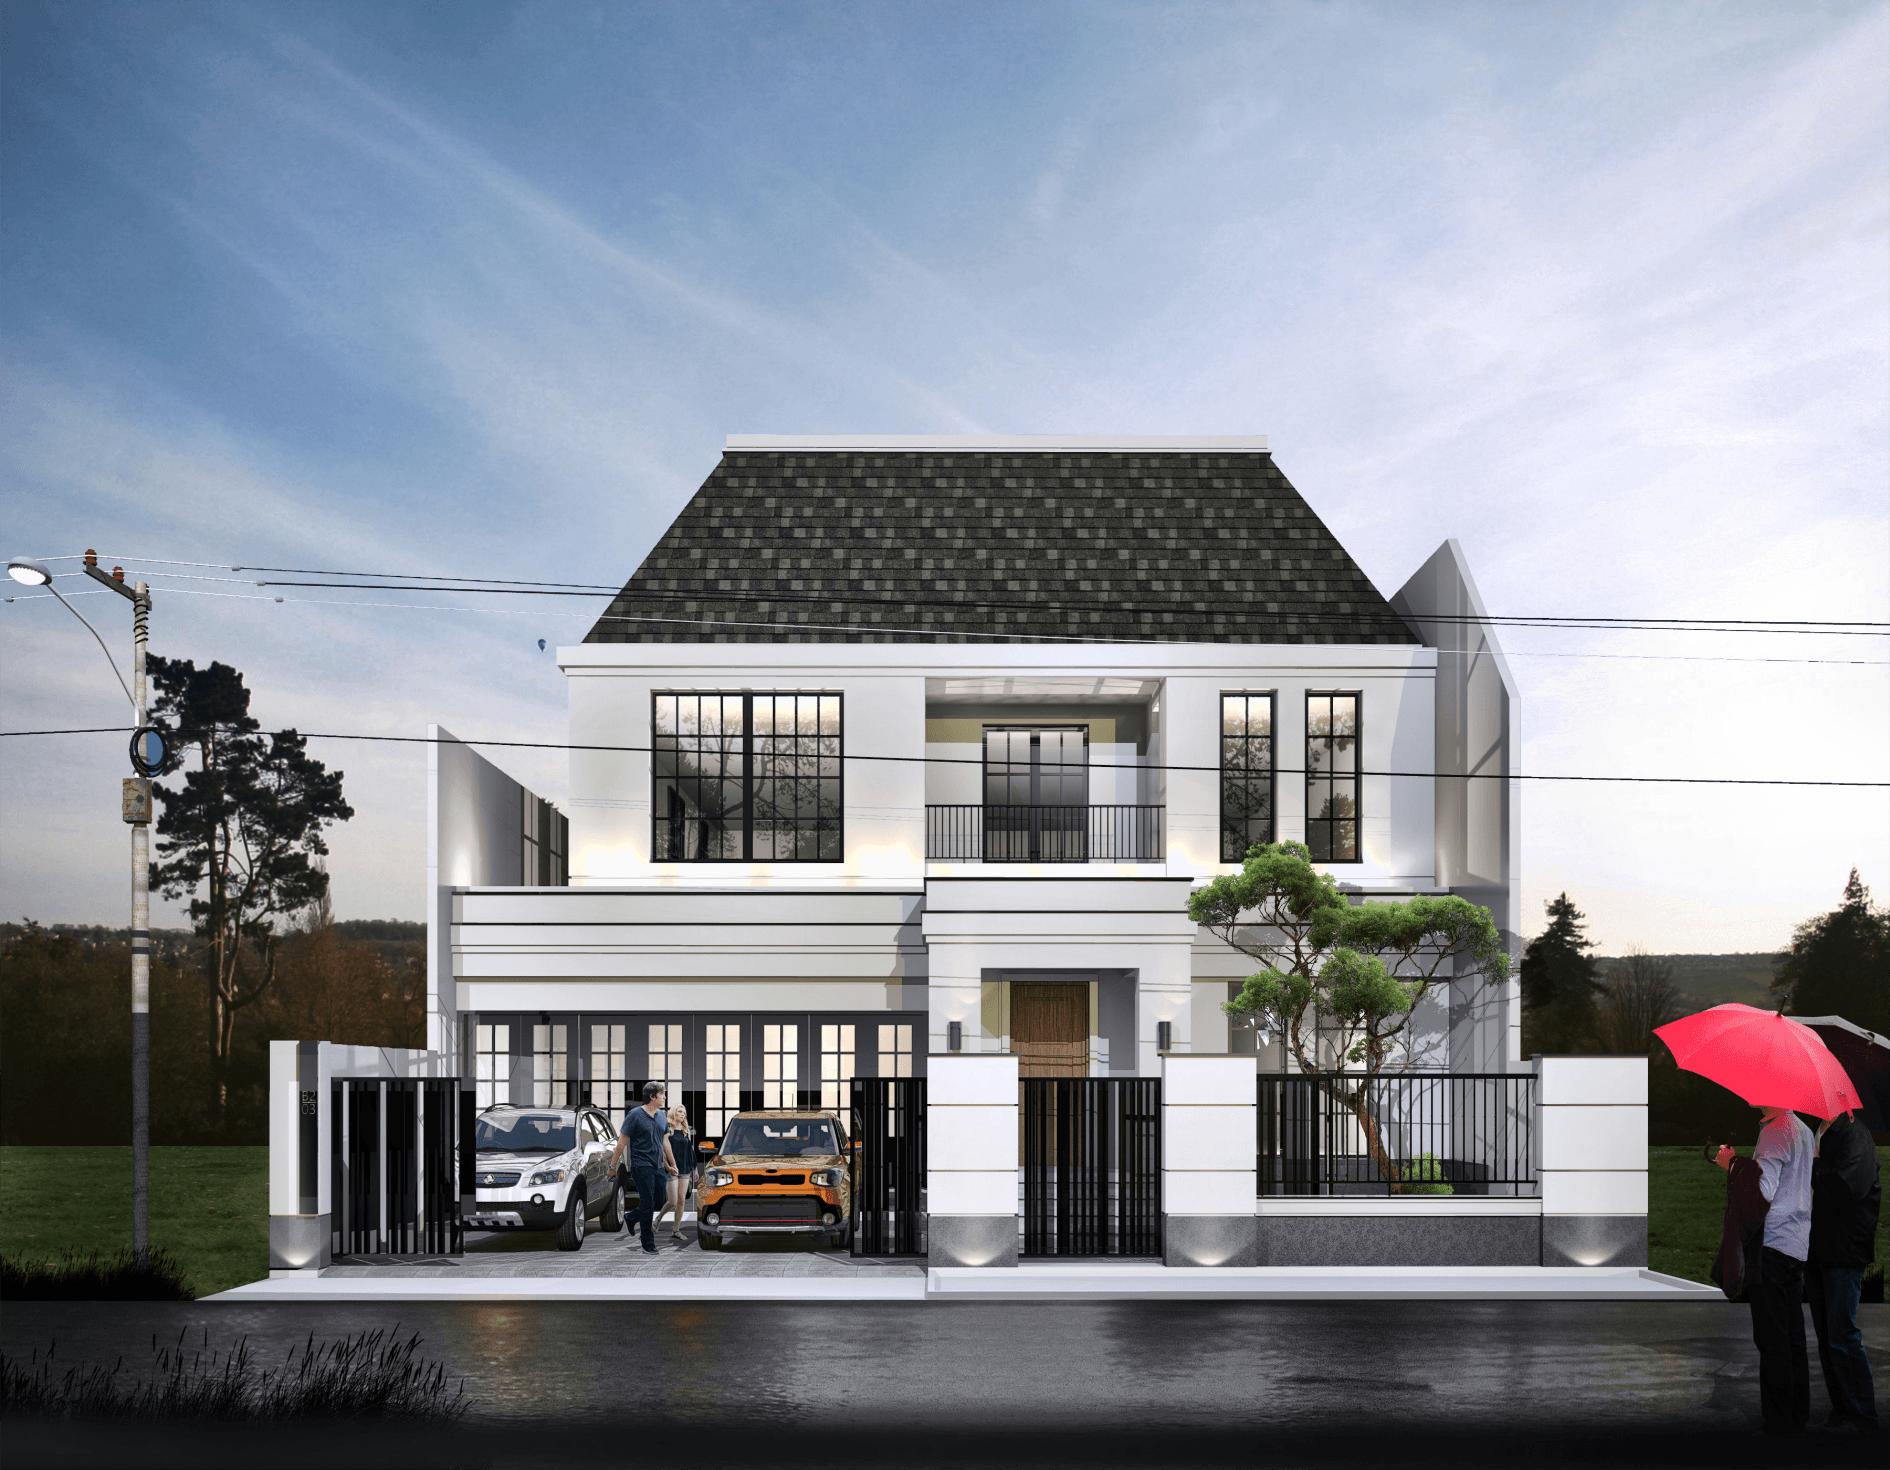 Atelier Baou Jb House Batam, Kota Batam, Kepulauan Riau, Indonesia Batam, Kota Batam, Kepulauan Riau, Indonesia Atelier-Baou-Jb-House   86492